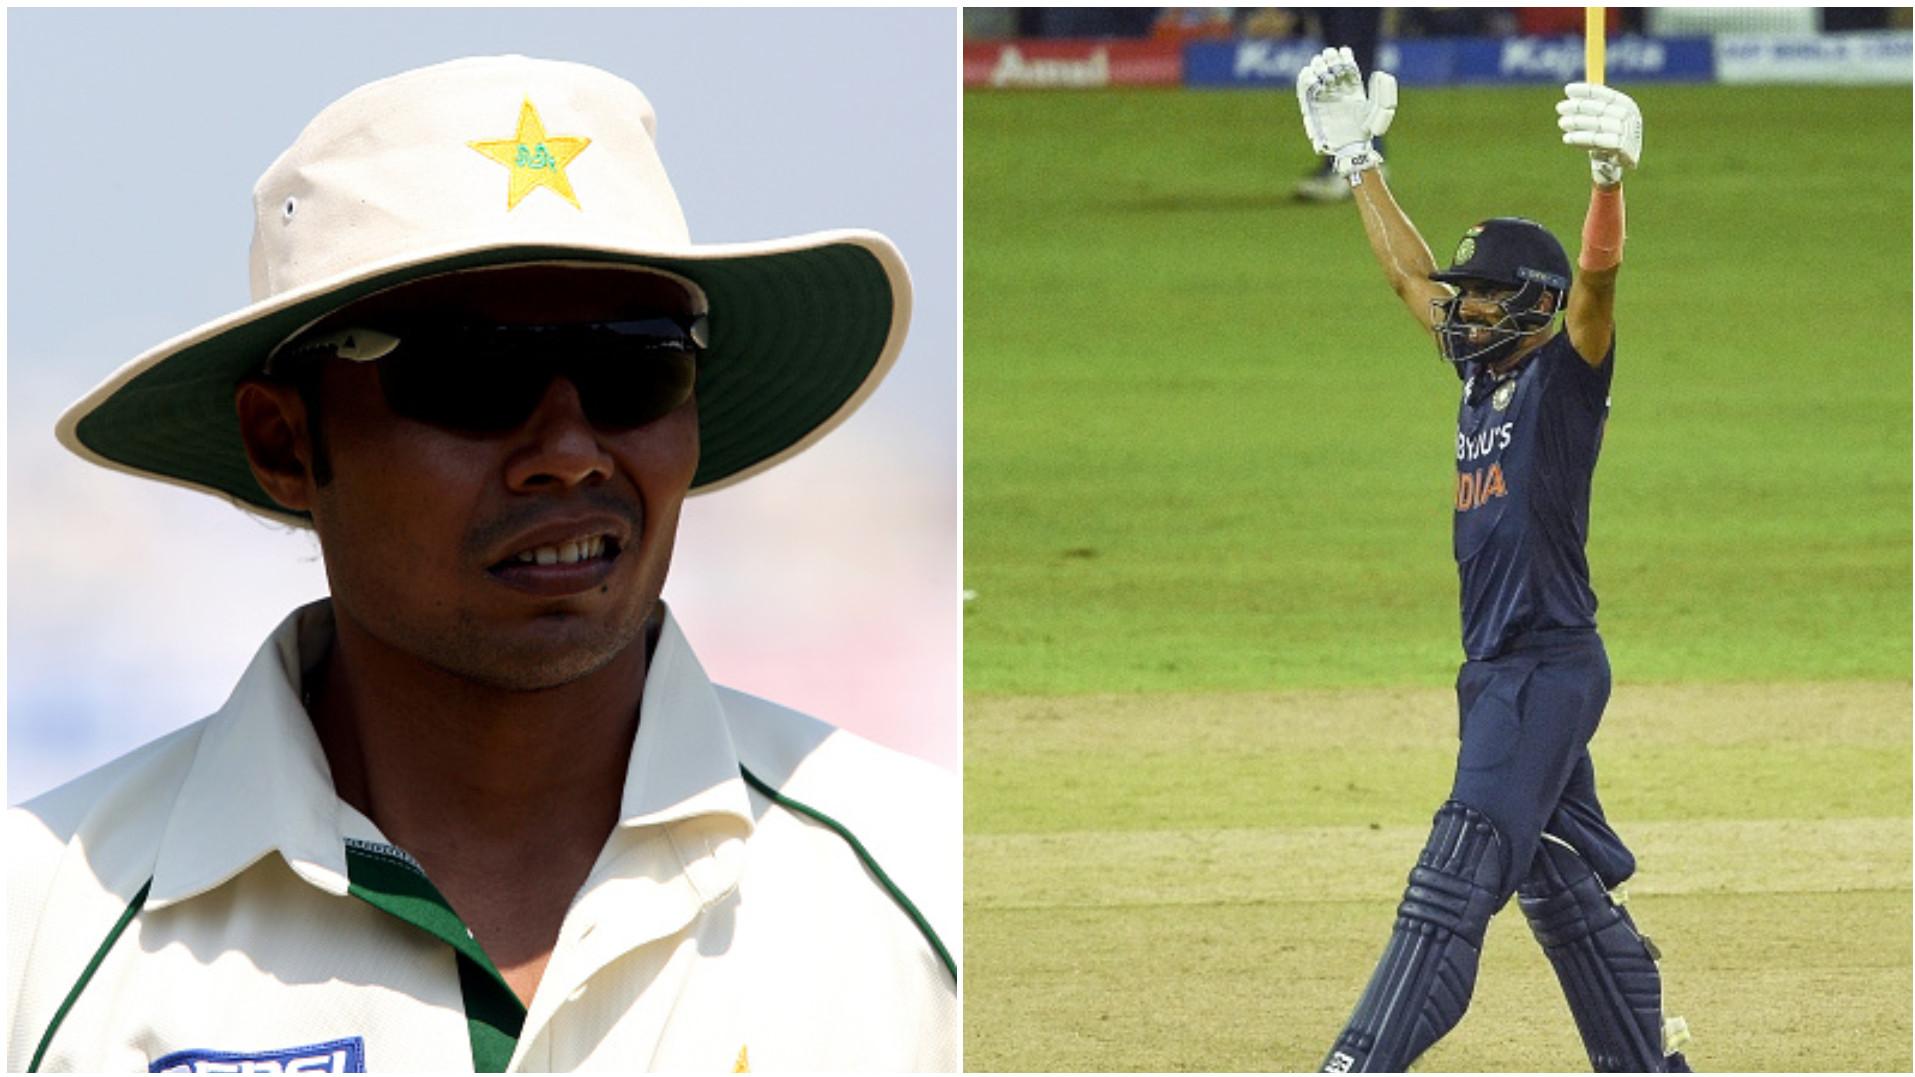 SL v IND 2021: Danish Kaneria lauds Deepak Chahar after his heroic batting in 2nd ODI vs Sri Lanka